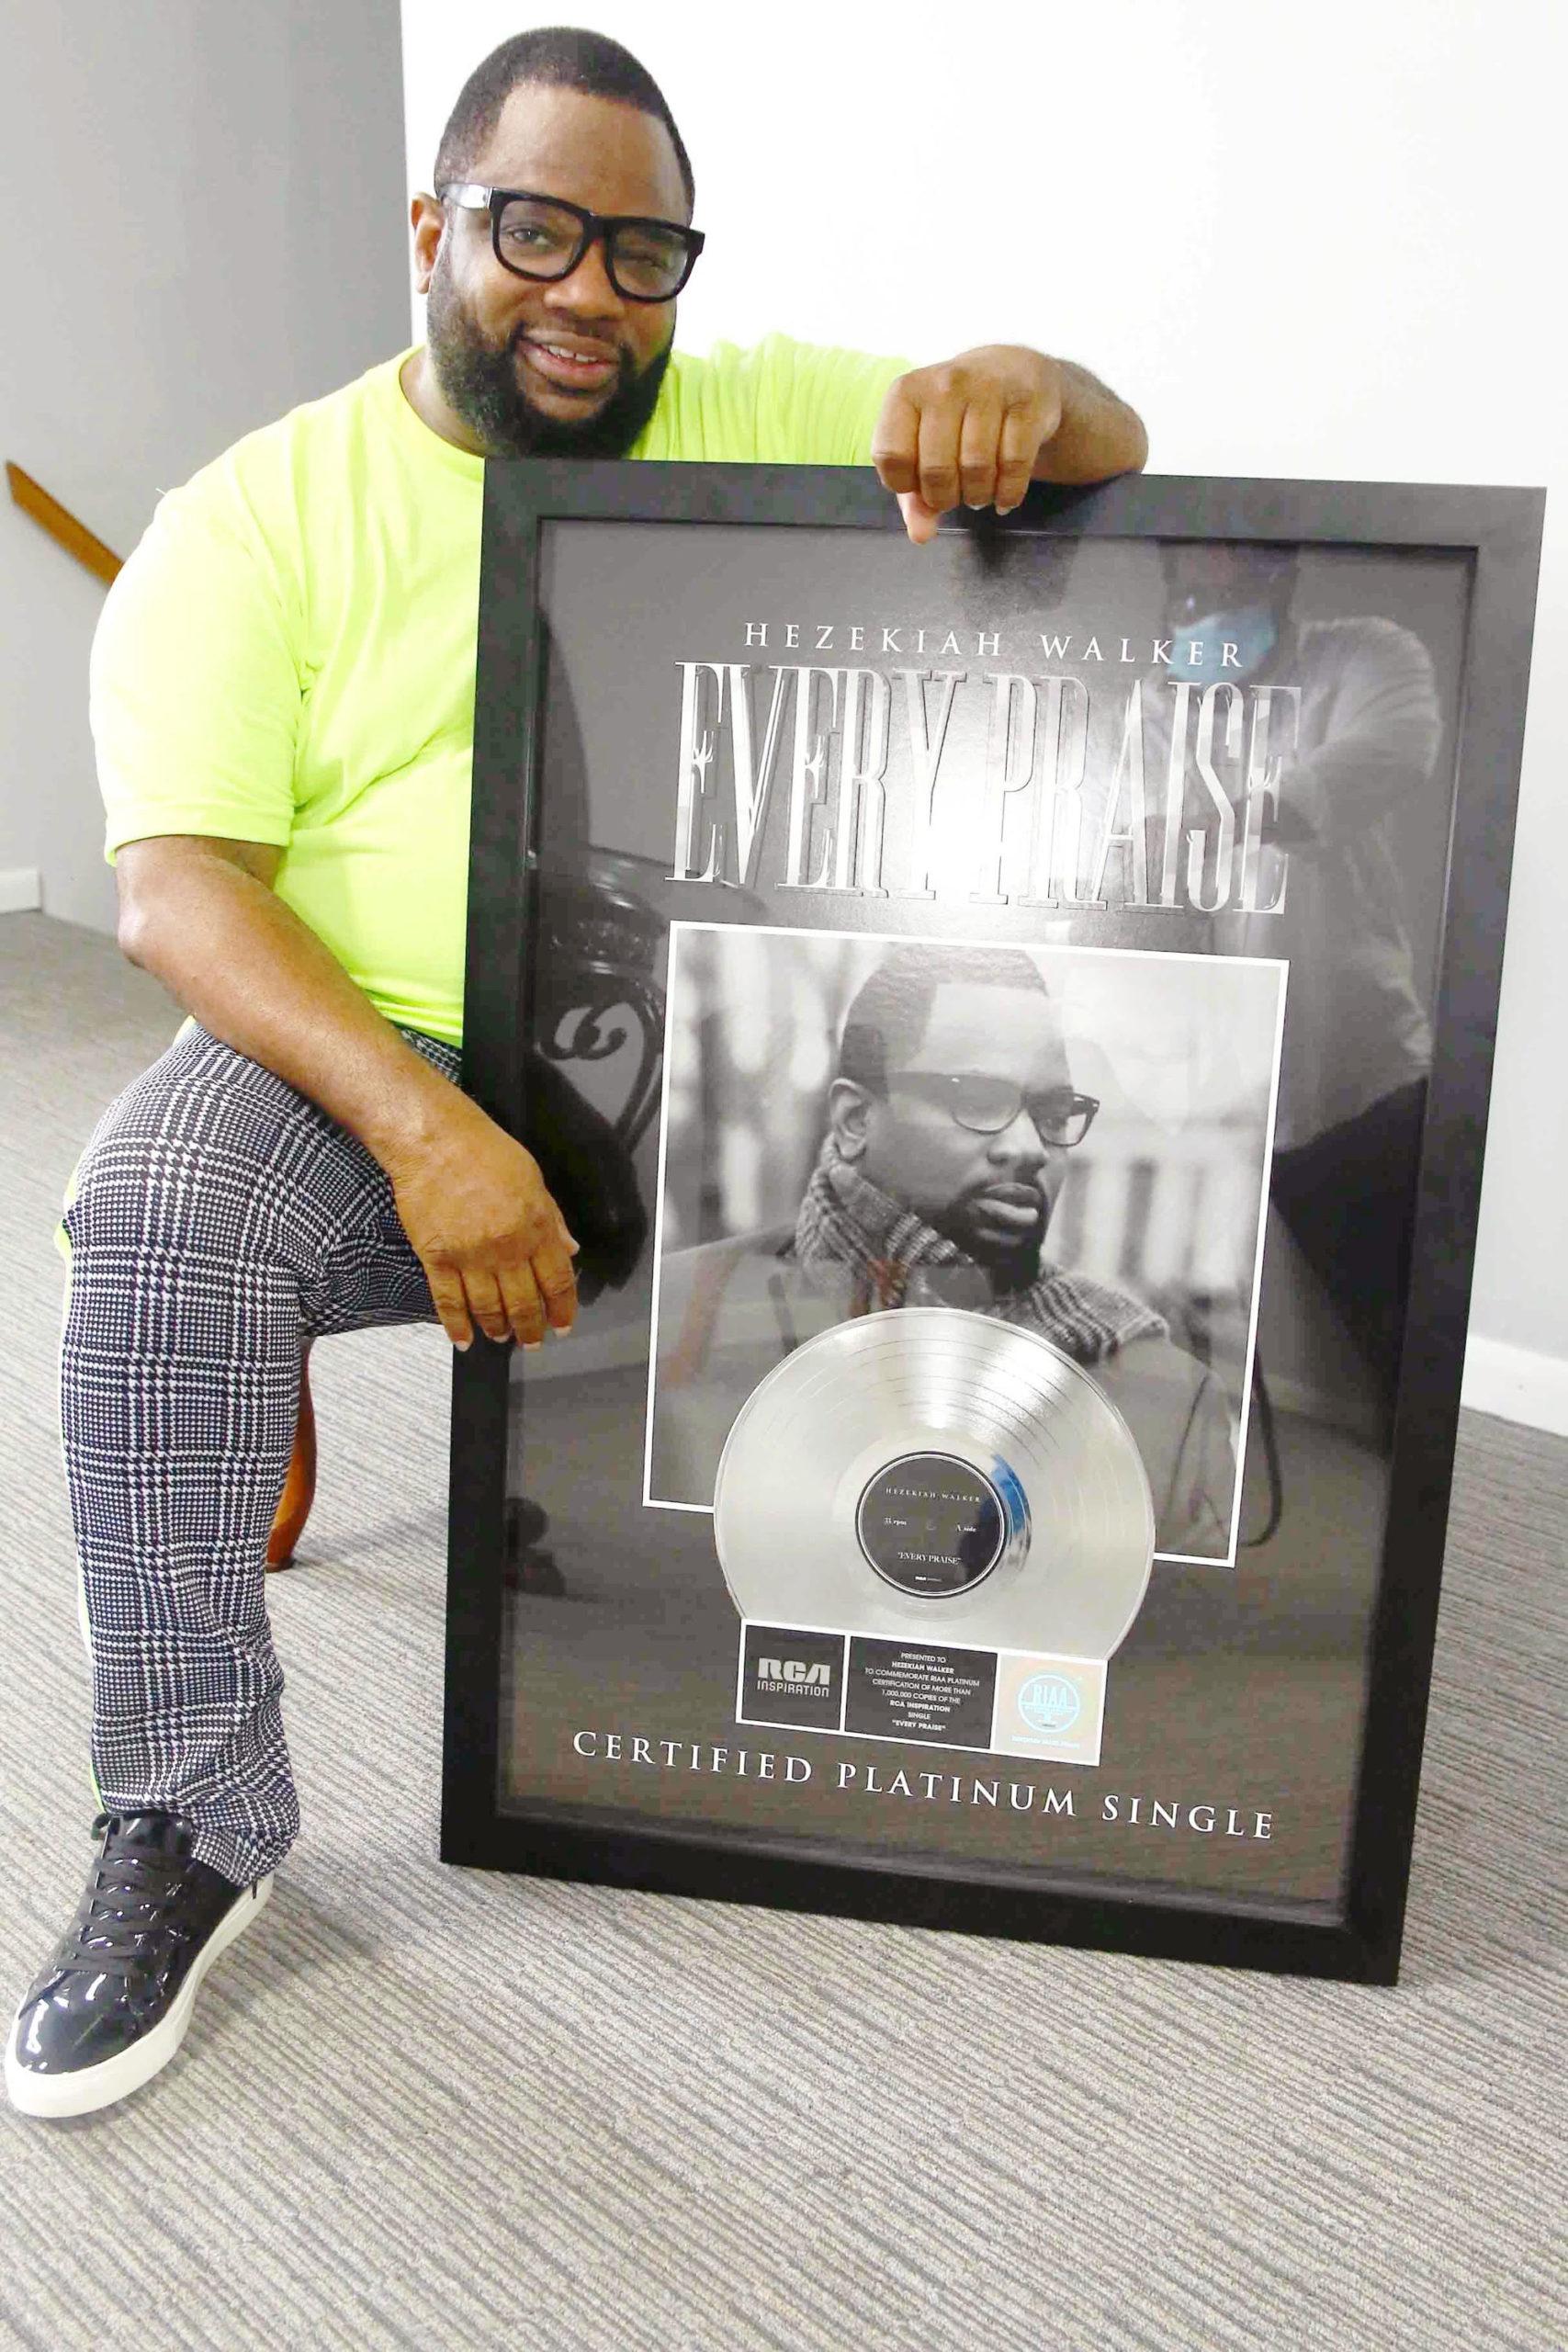 Hezekiah Walker's Every Praise Is Certified Platinum